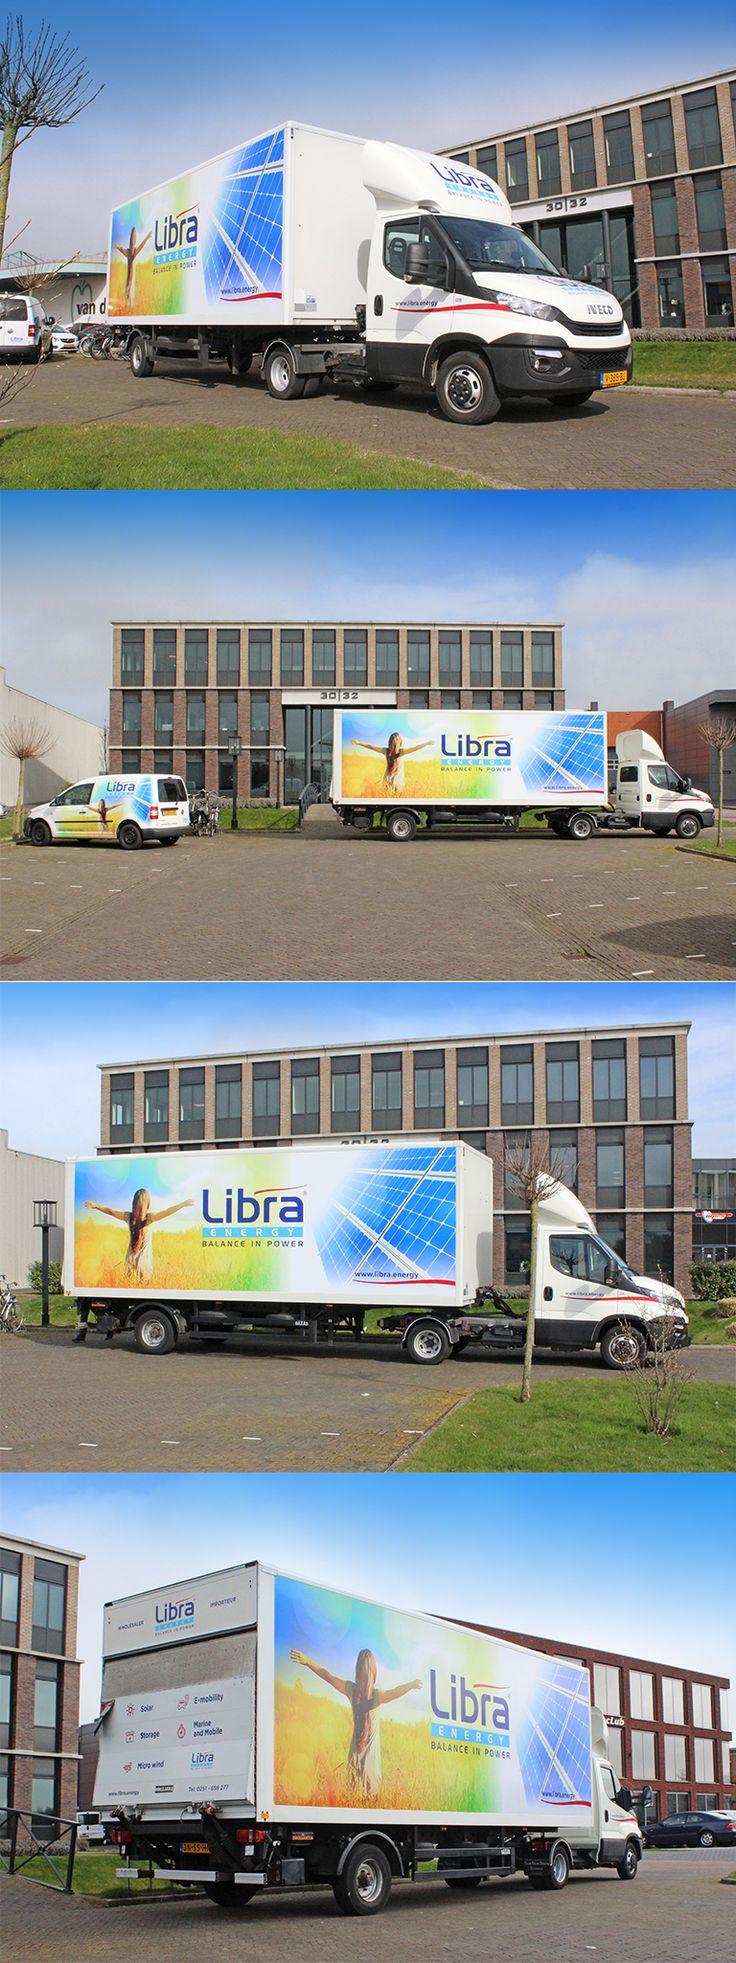 Belettering Design Iveco Truck for Libra Energy